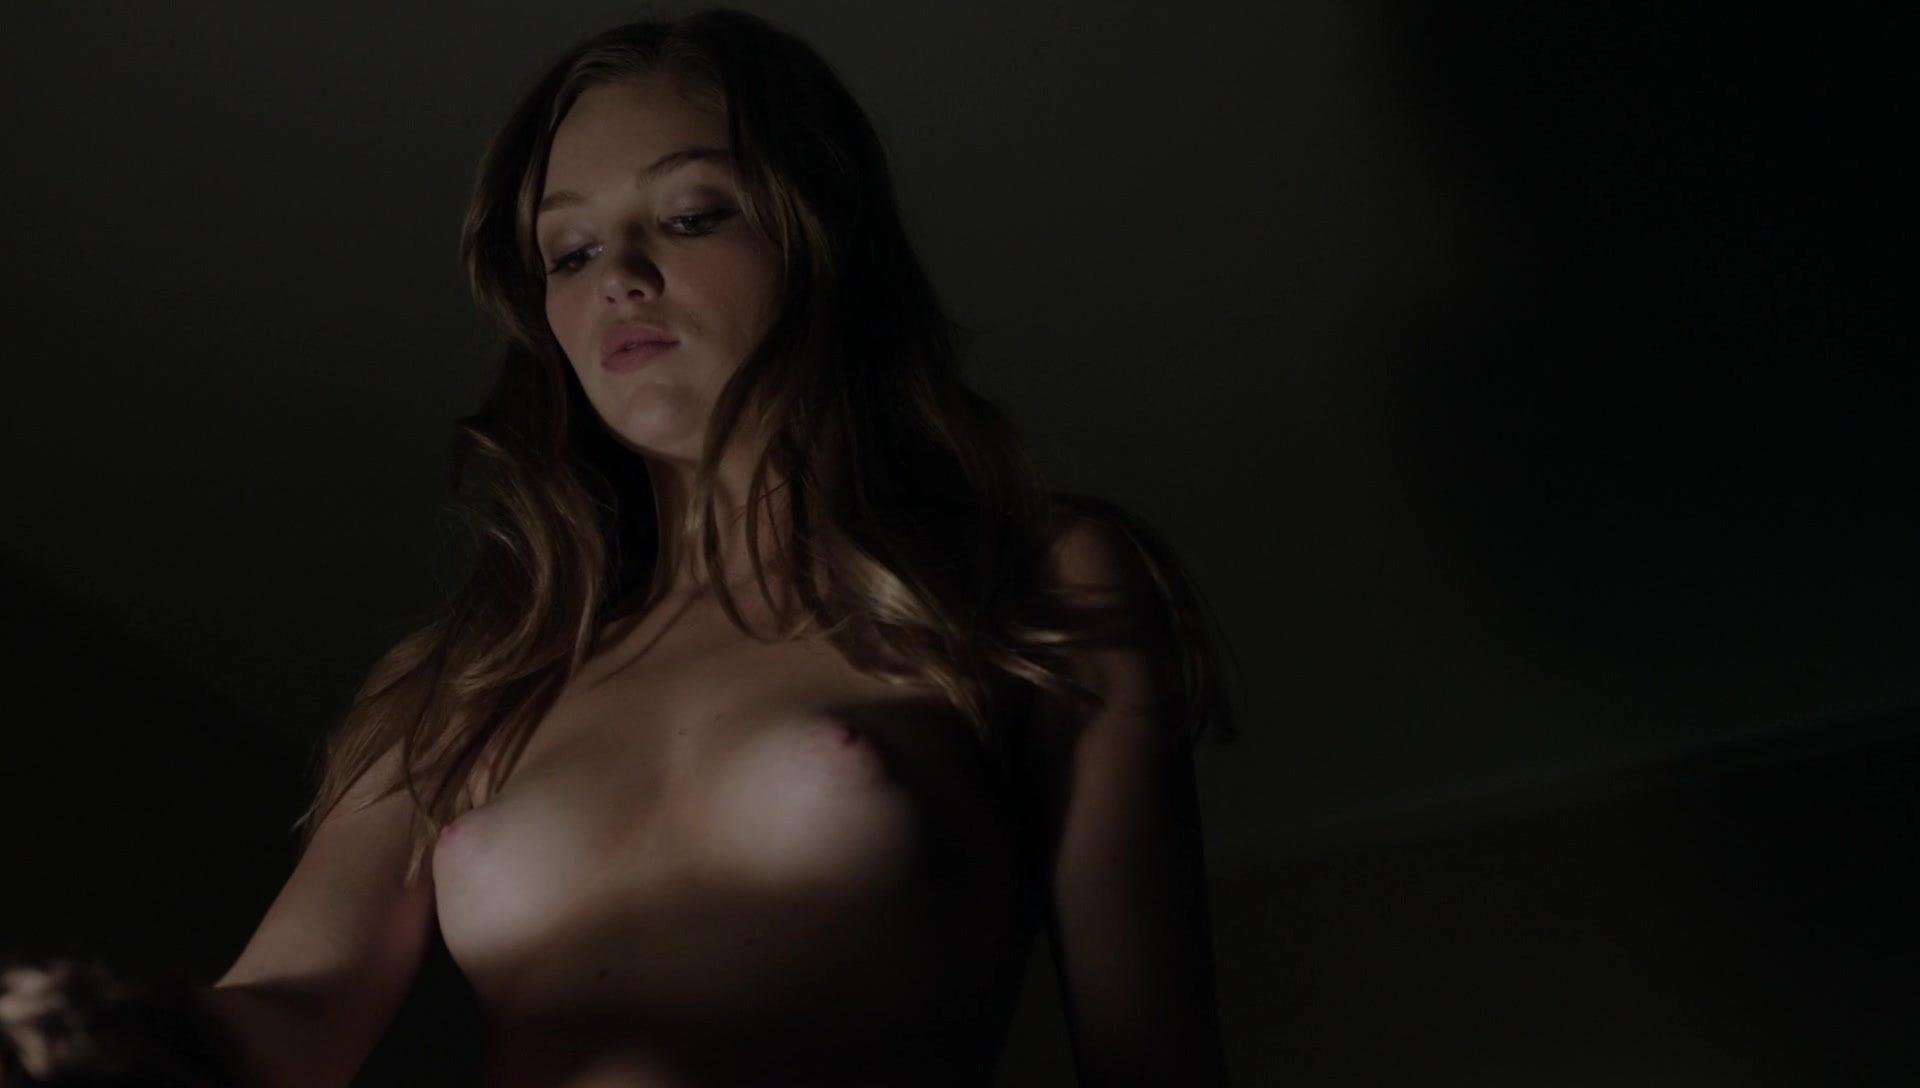 Tania saulnier topless